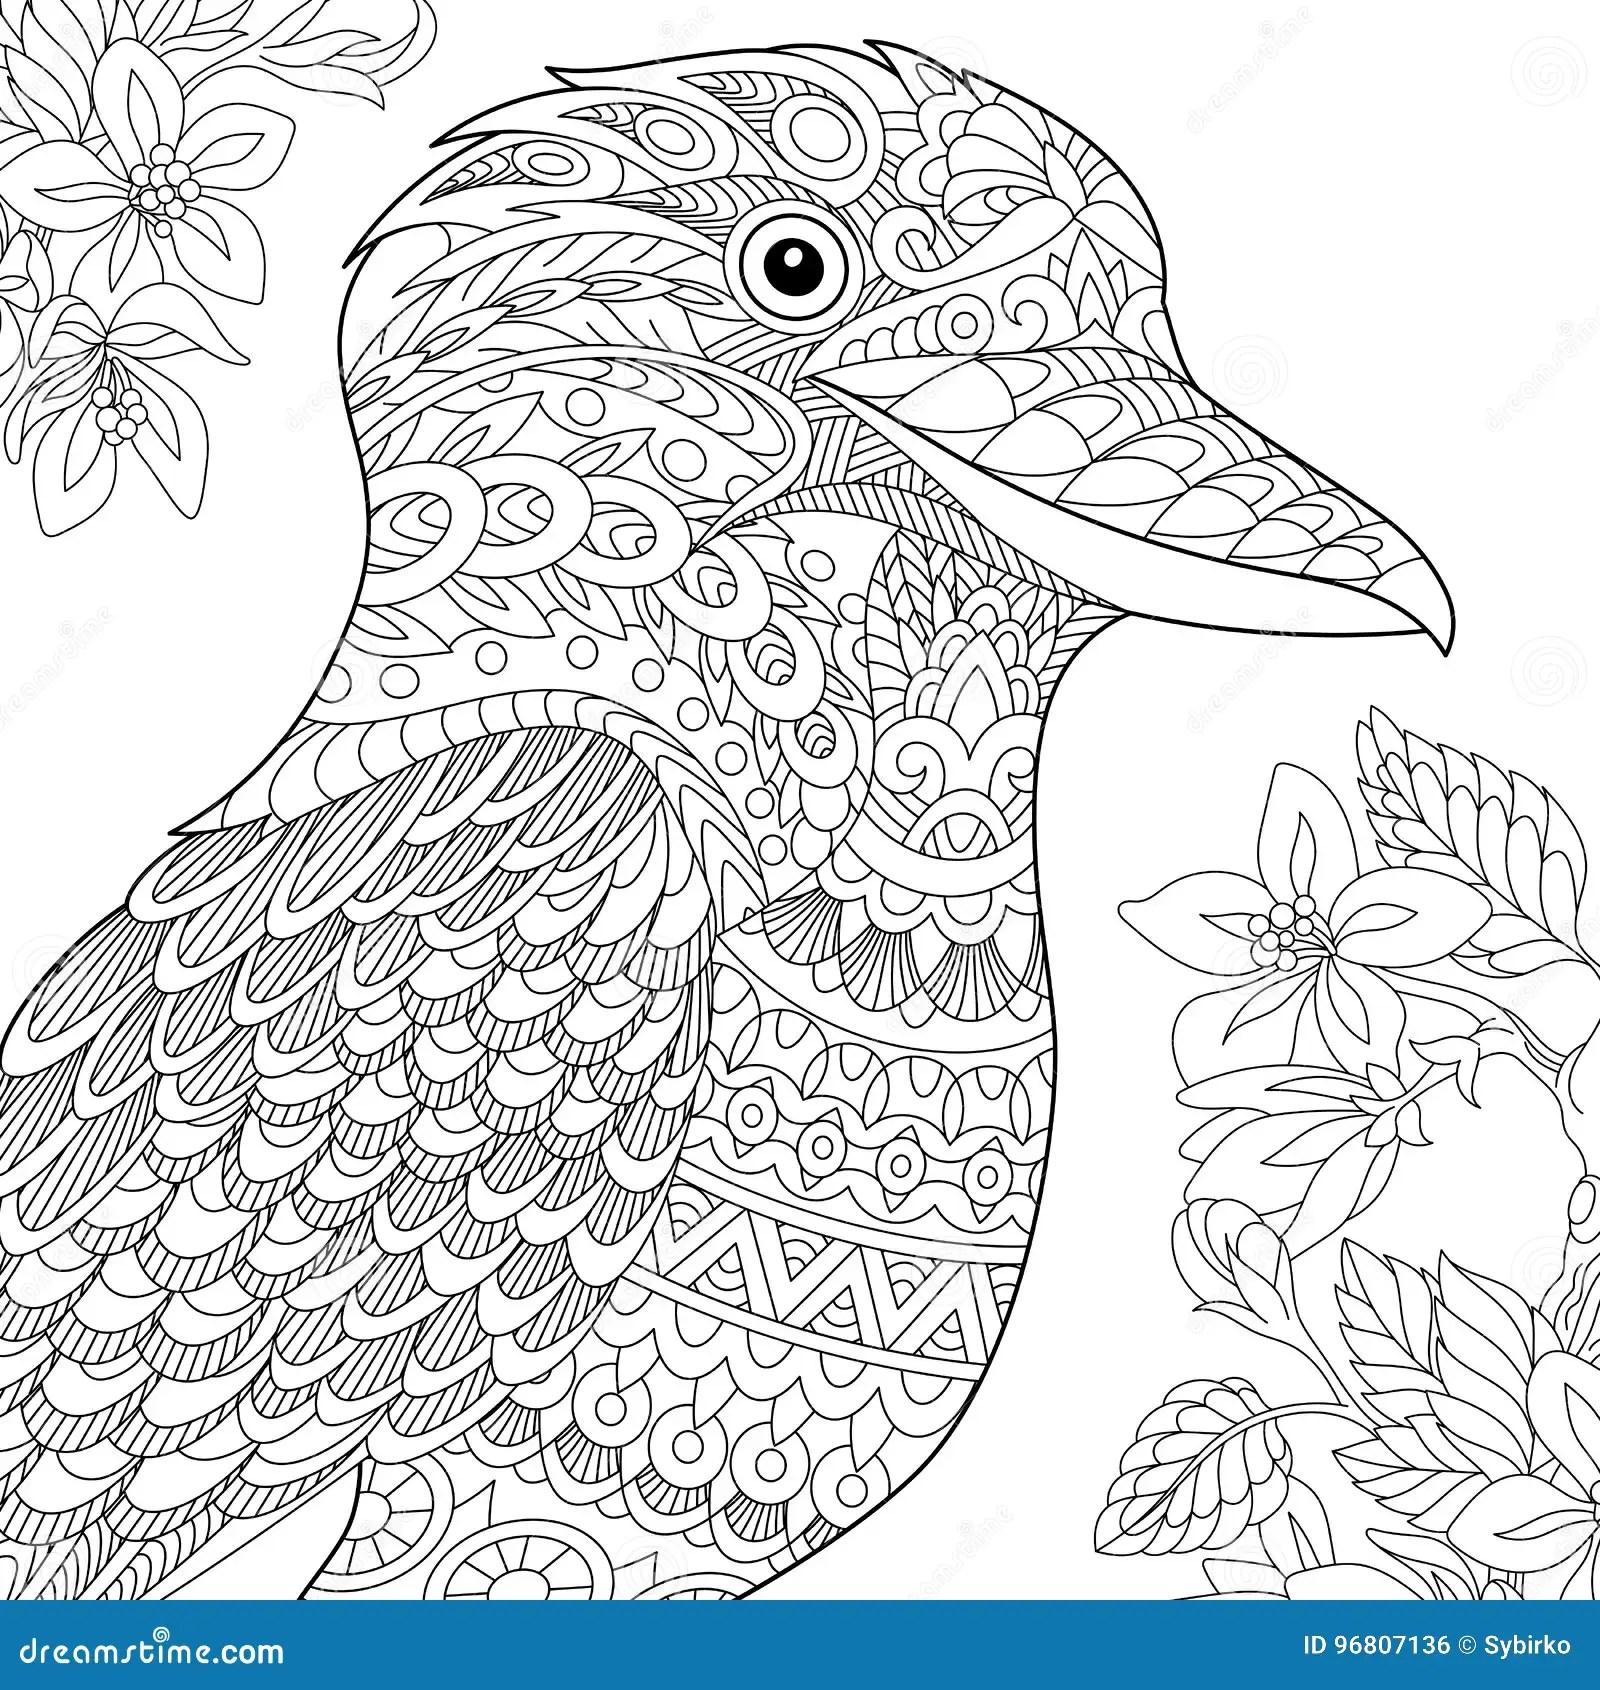 Kookaburra Cartoons, Illustrations & Vector Stock Images